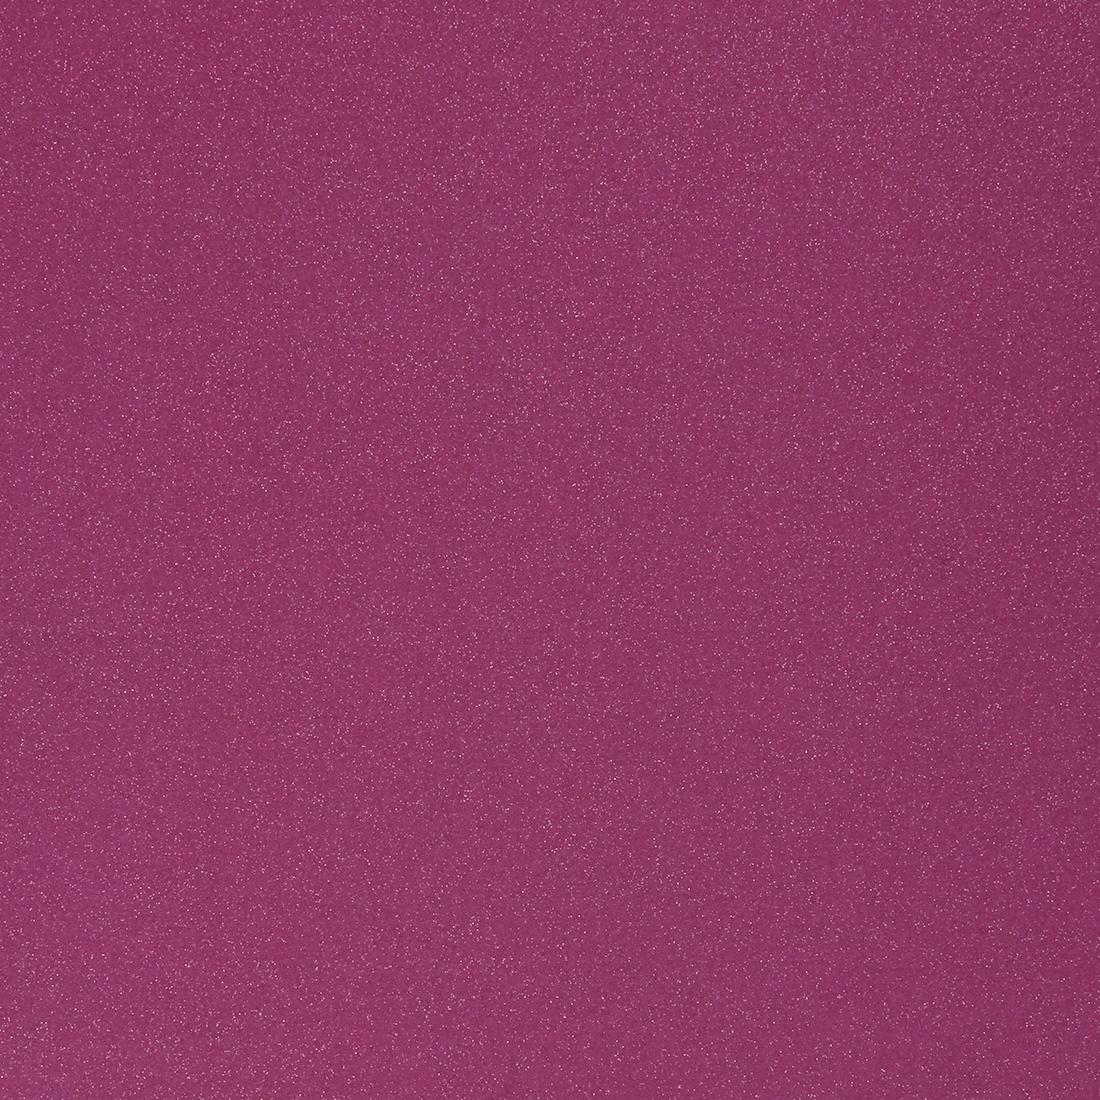 Glitter Cotton Fuschia Craft Fabric